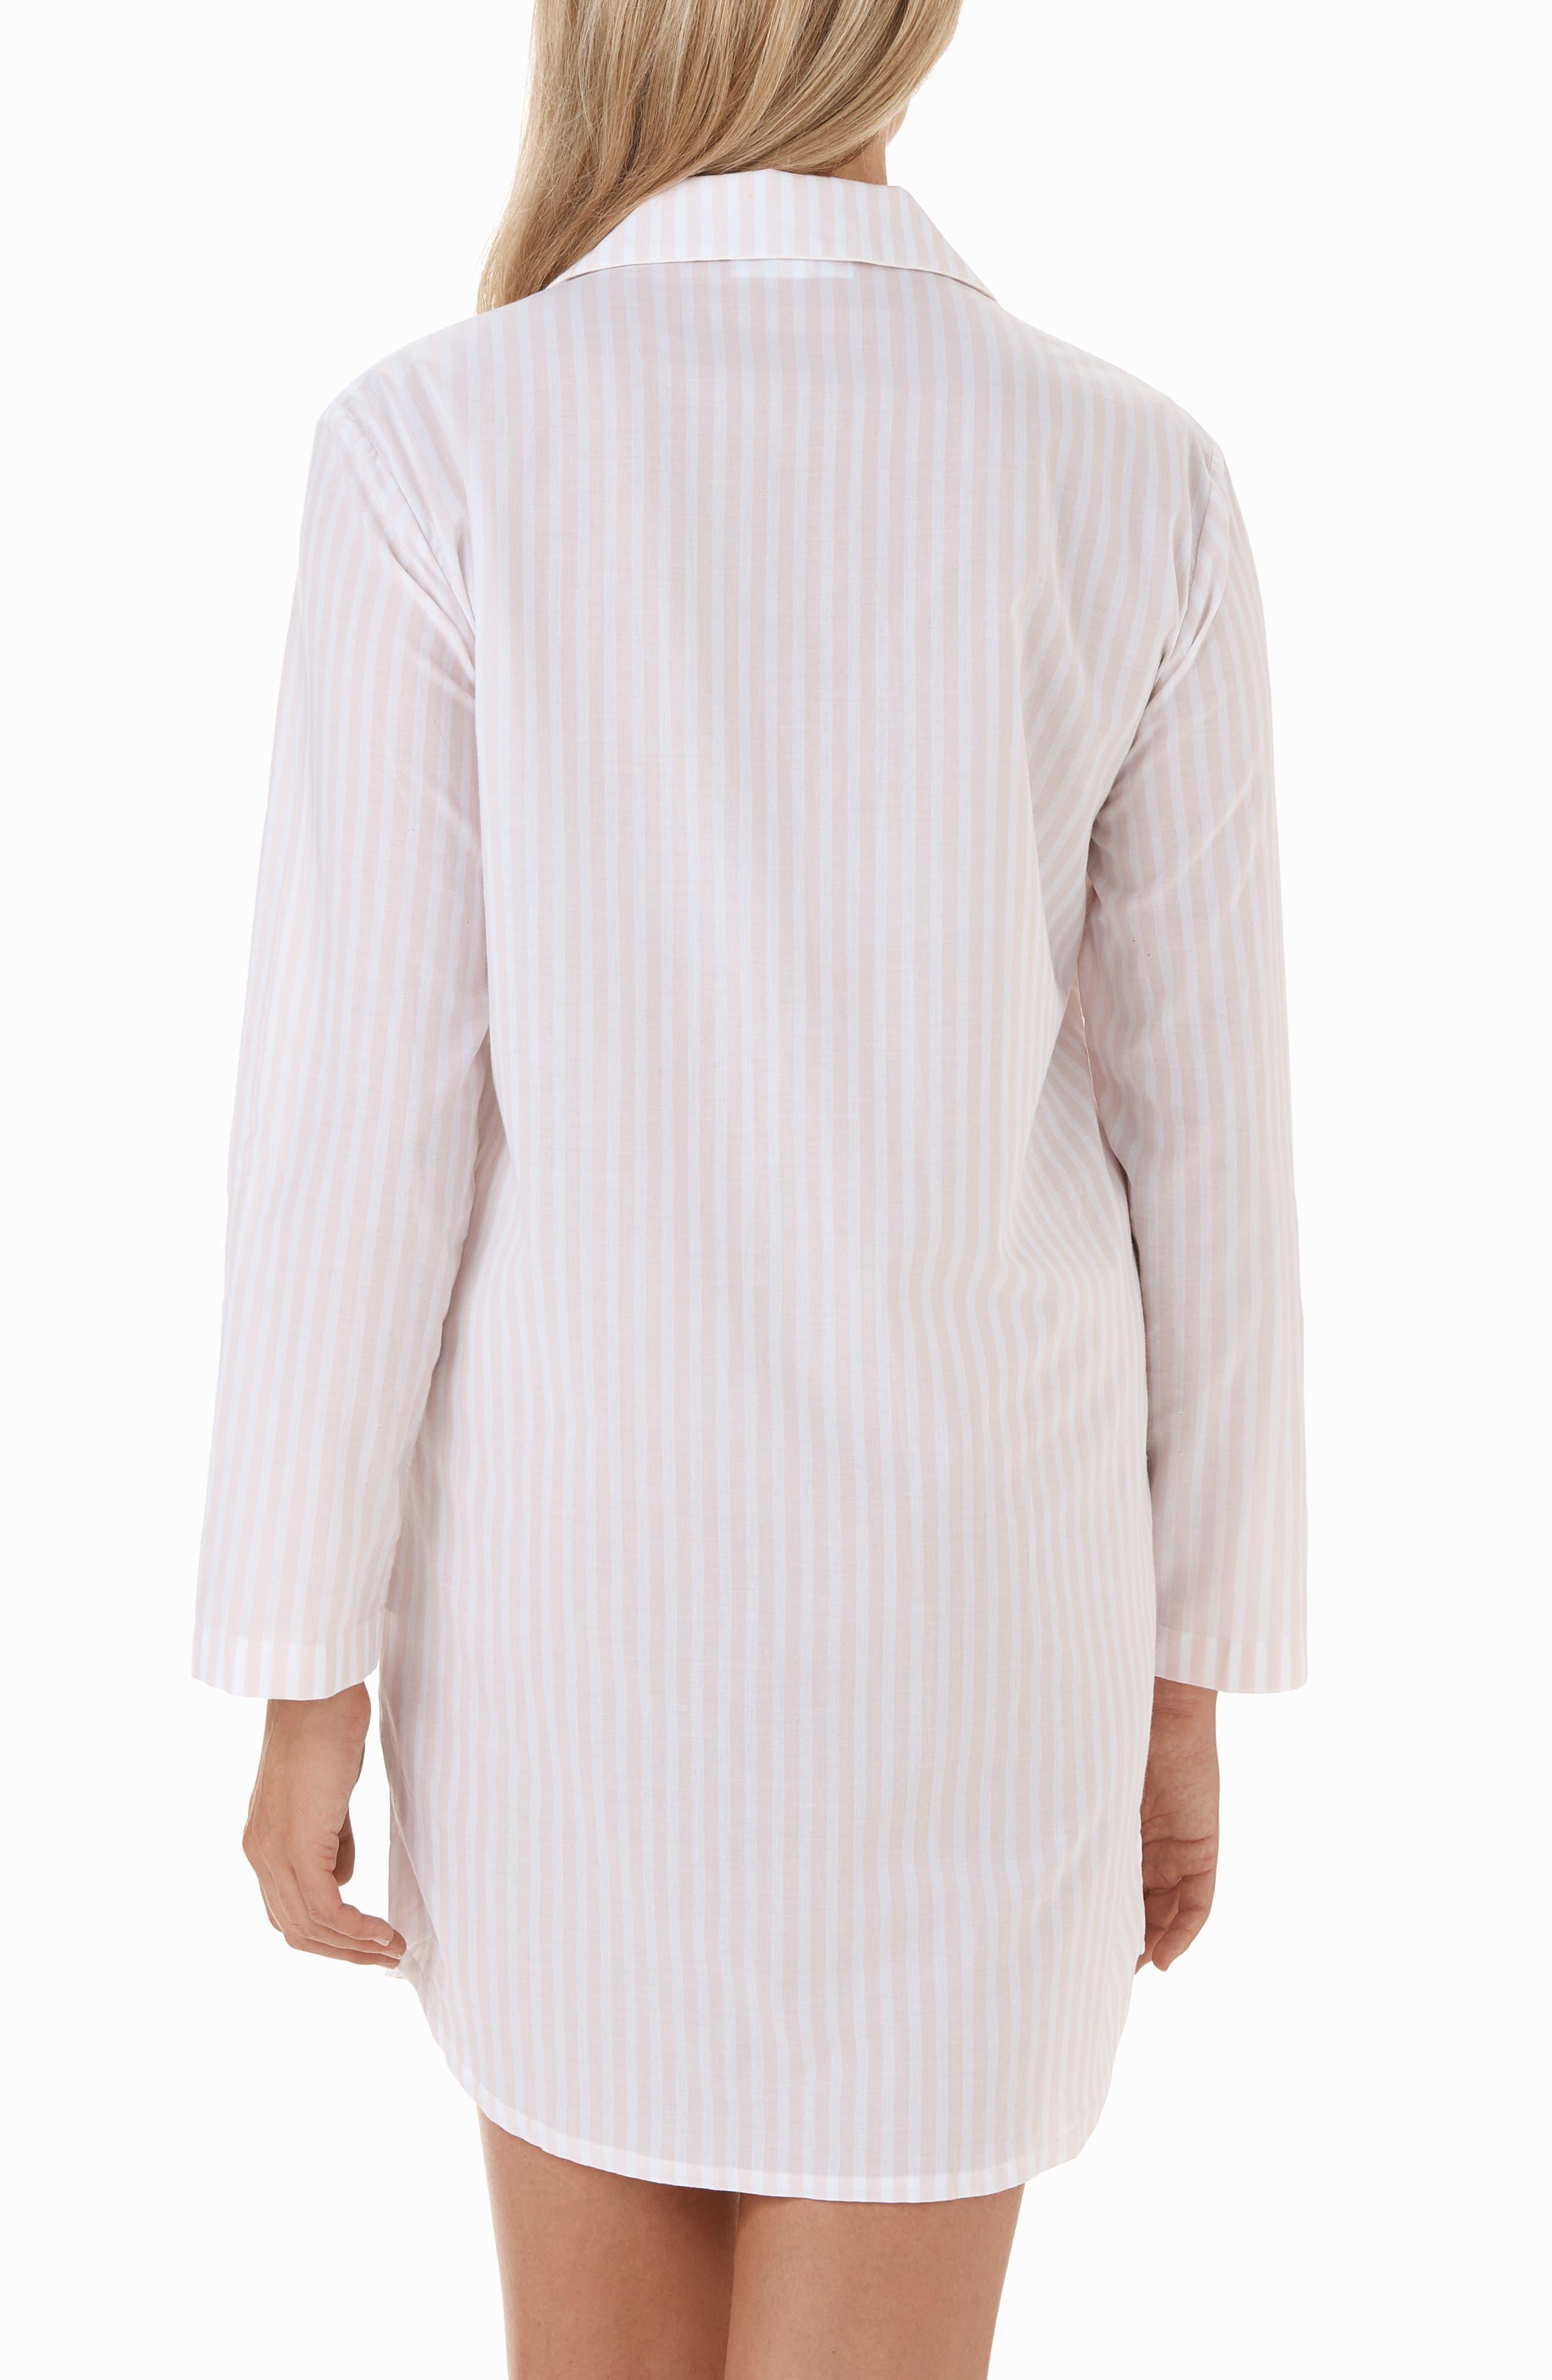 Stripe Cotton Sleep Shirt,                             Alternate thumbnail 2, color,                             PINK / WHITE STRIPE